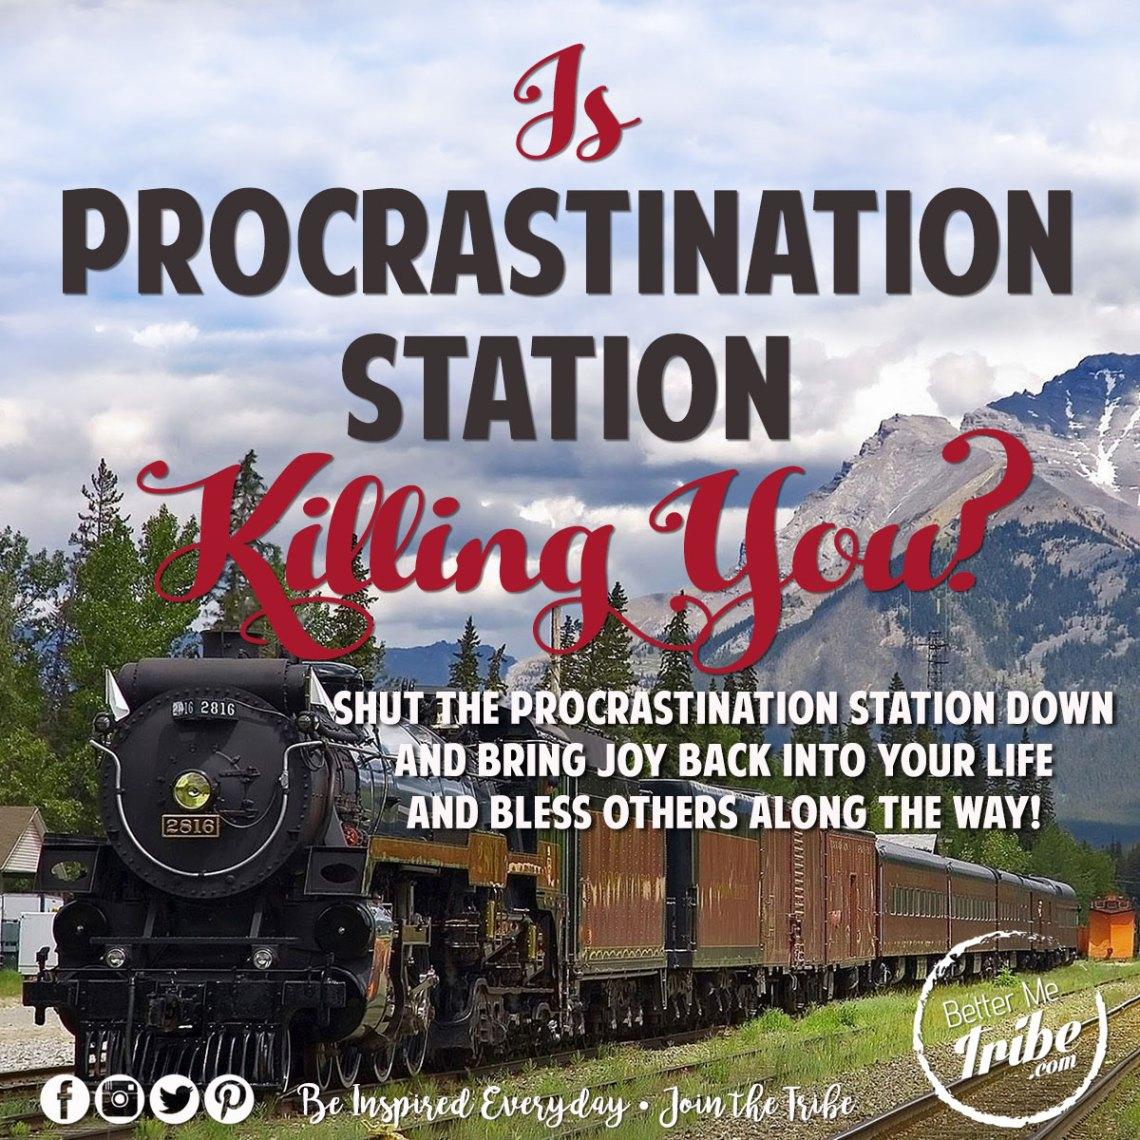 ProcrastinationStation-web